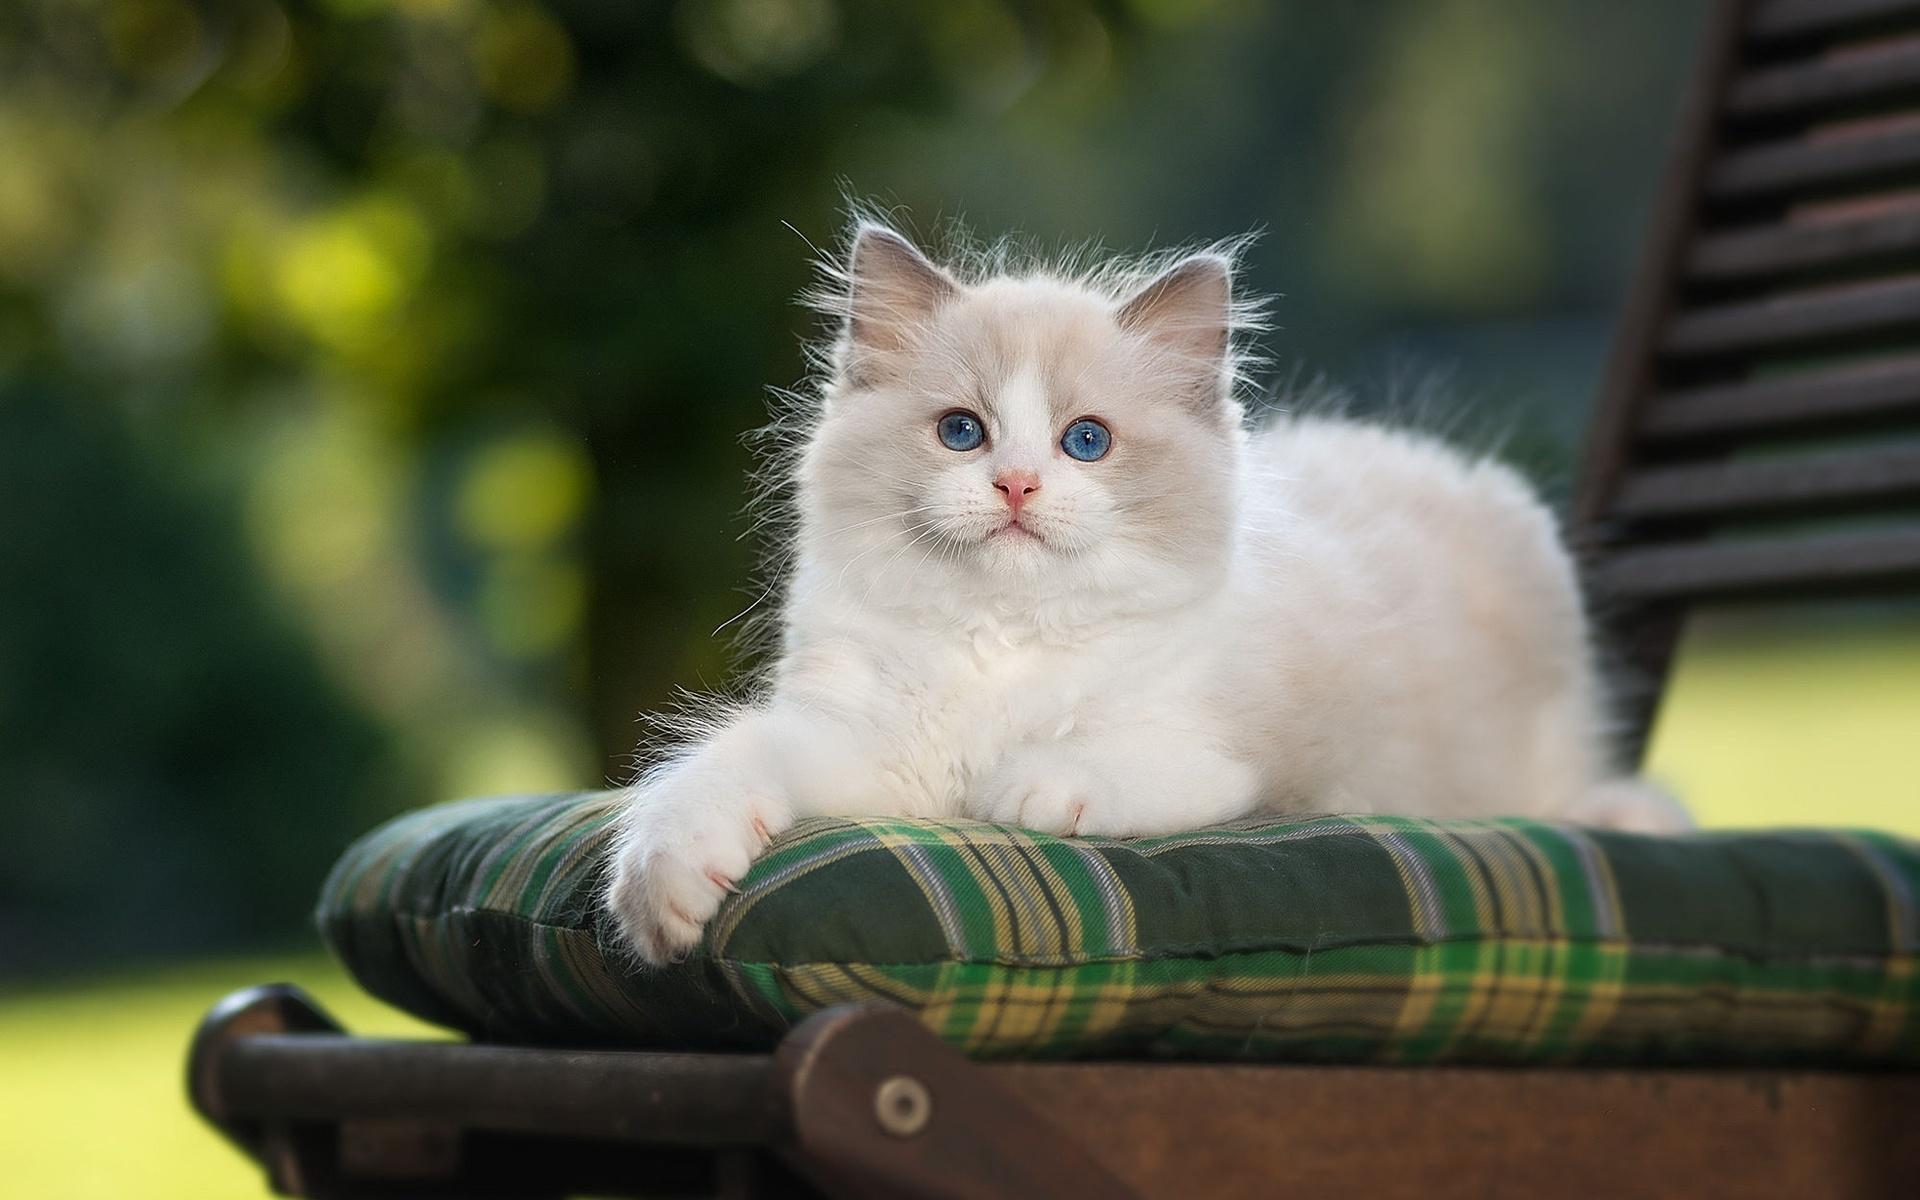 животное, кот, кошка, рэгдолл, стул, подушка